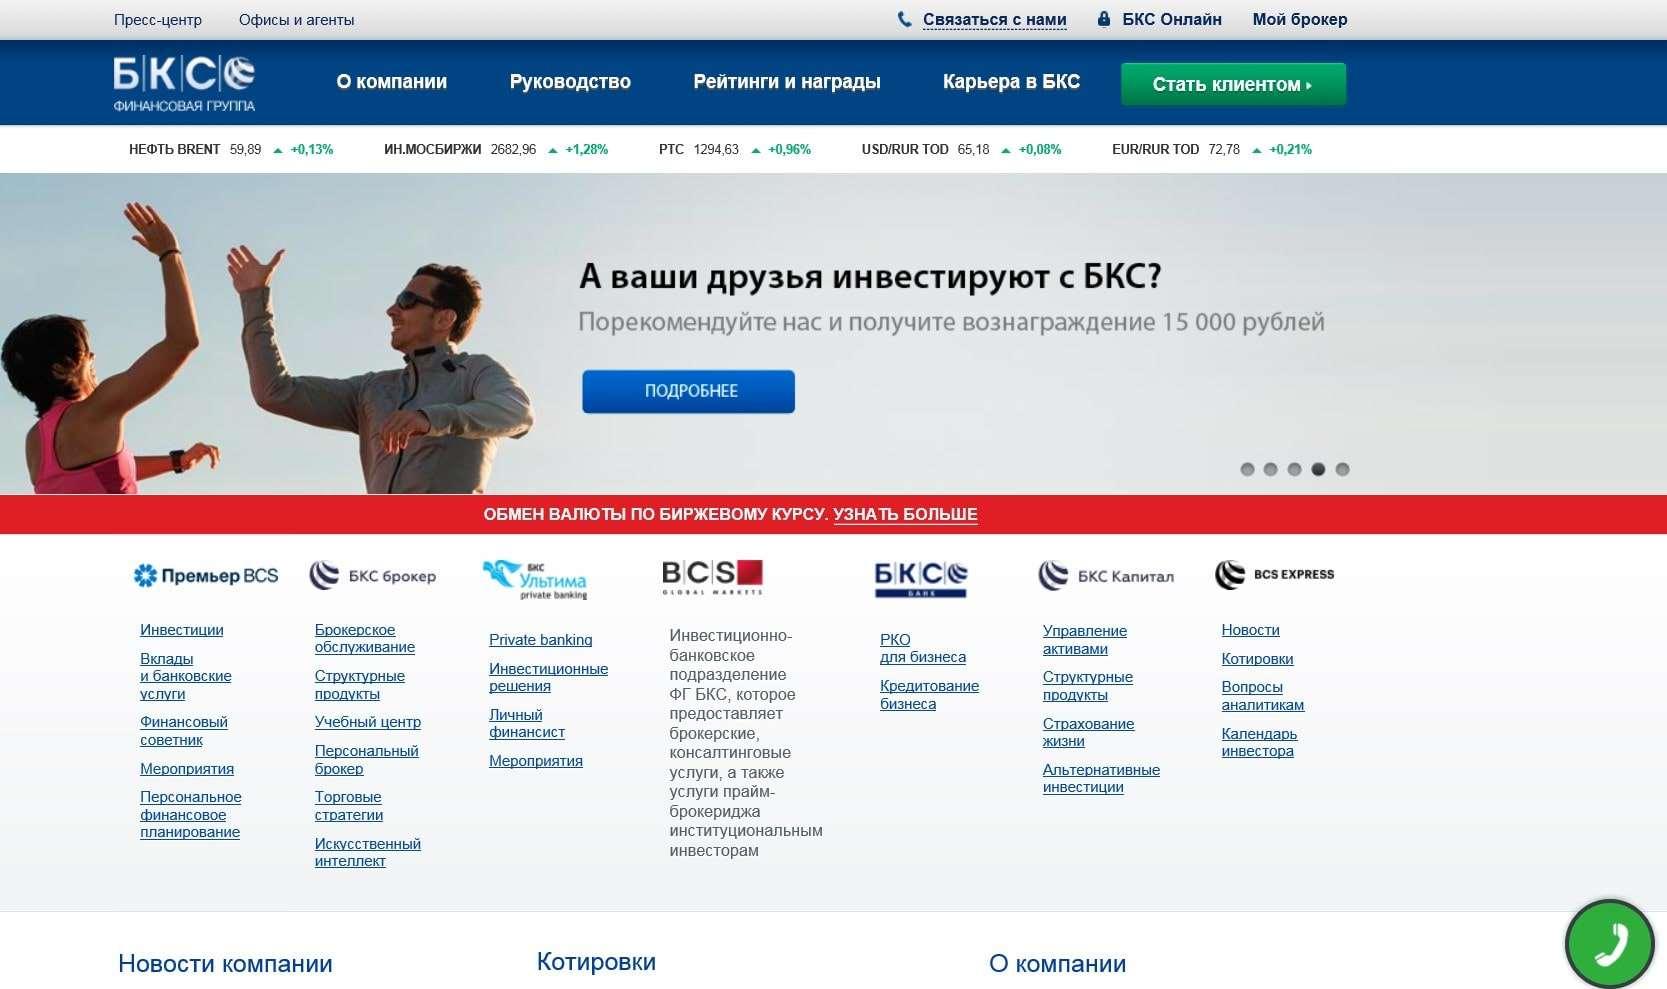 БКС-инвестиции: обзор брокерской компании